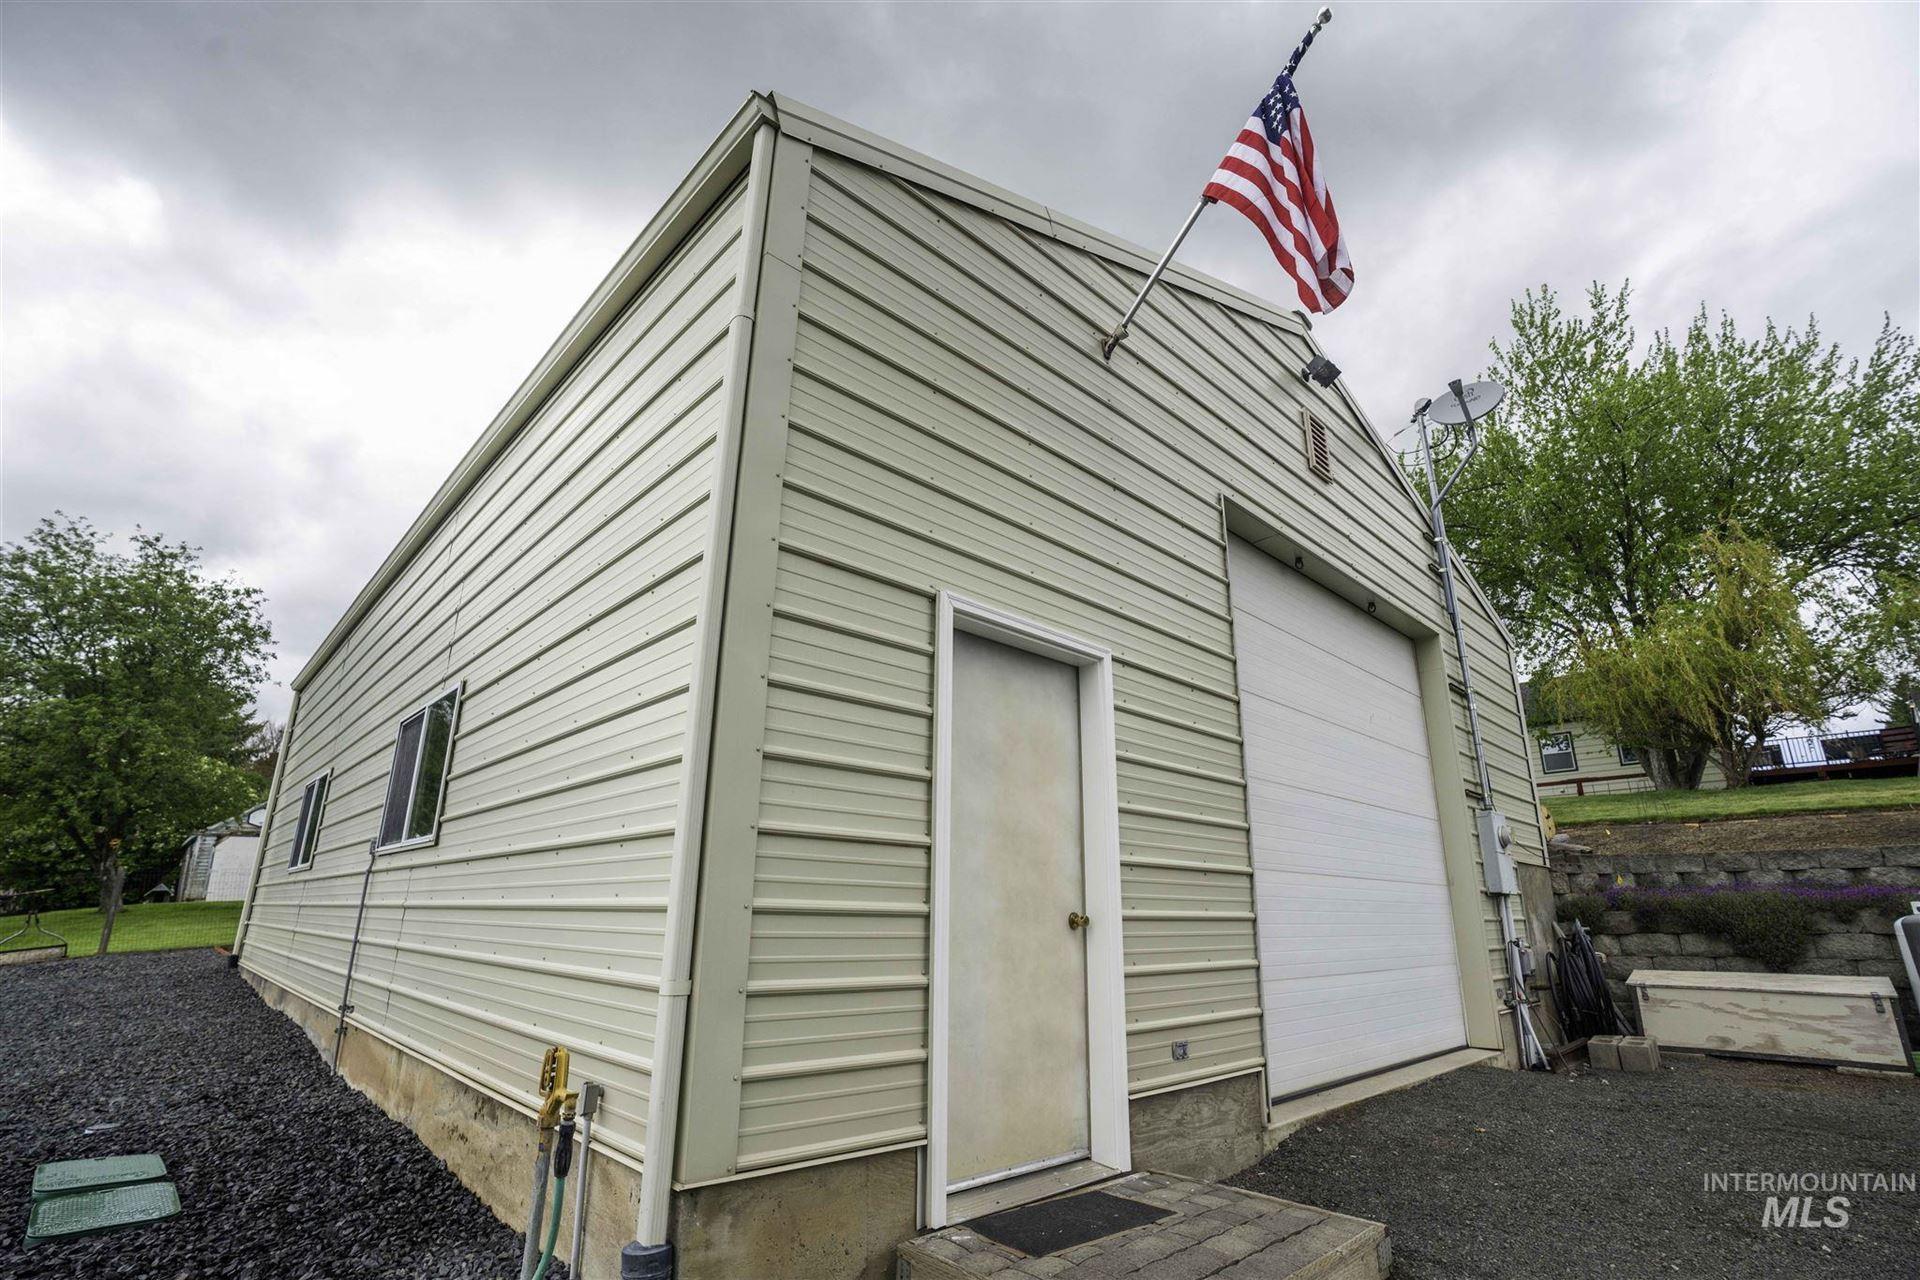 Photo of 714 W Chestnut St, Genesee, ID 83832 (MLS # 98767065)